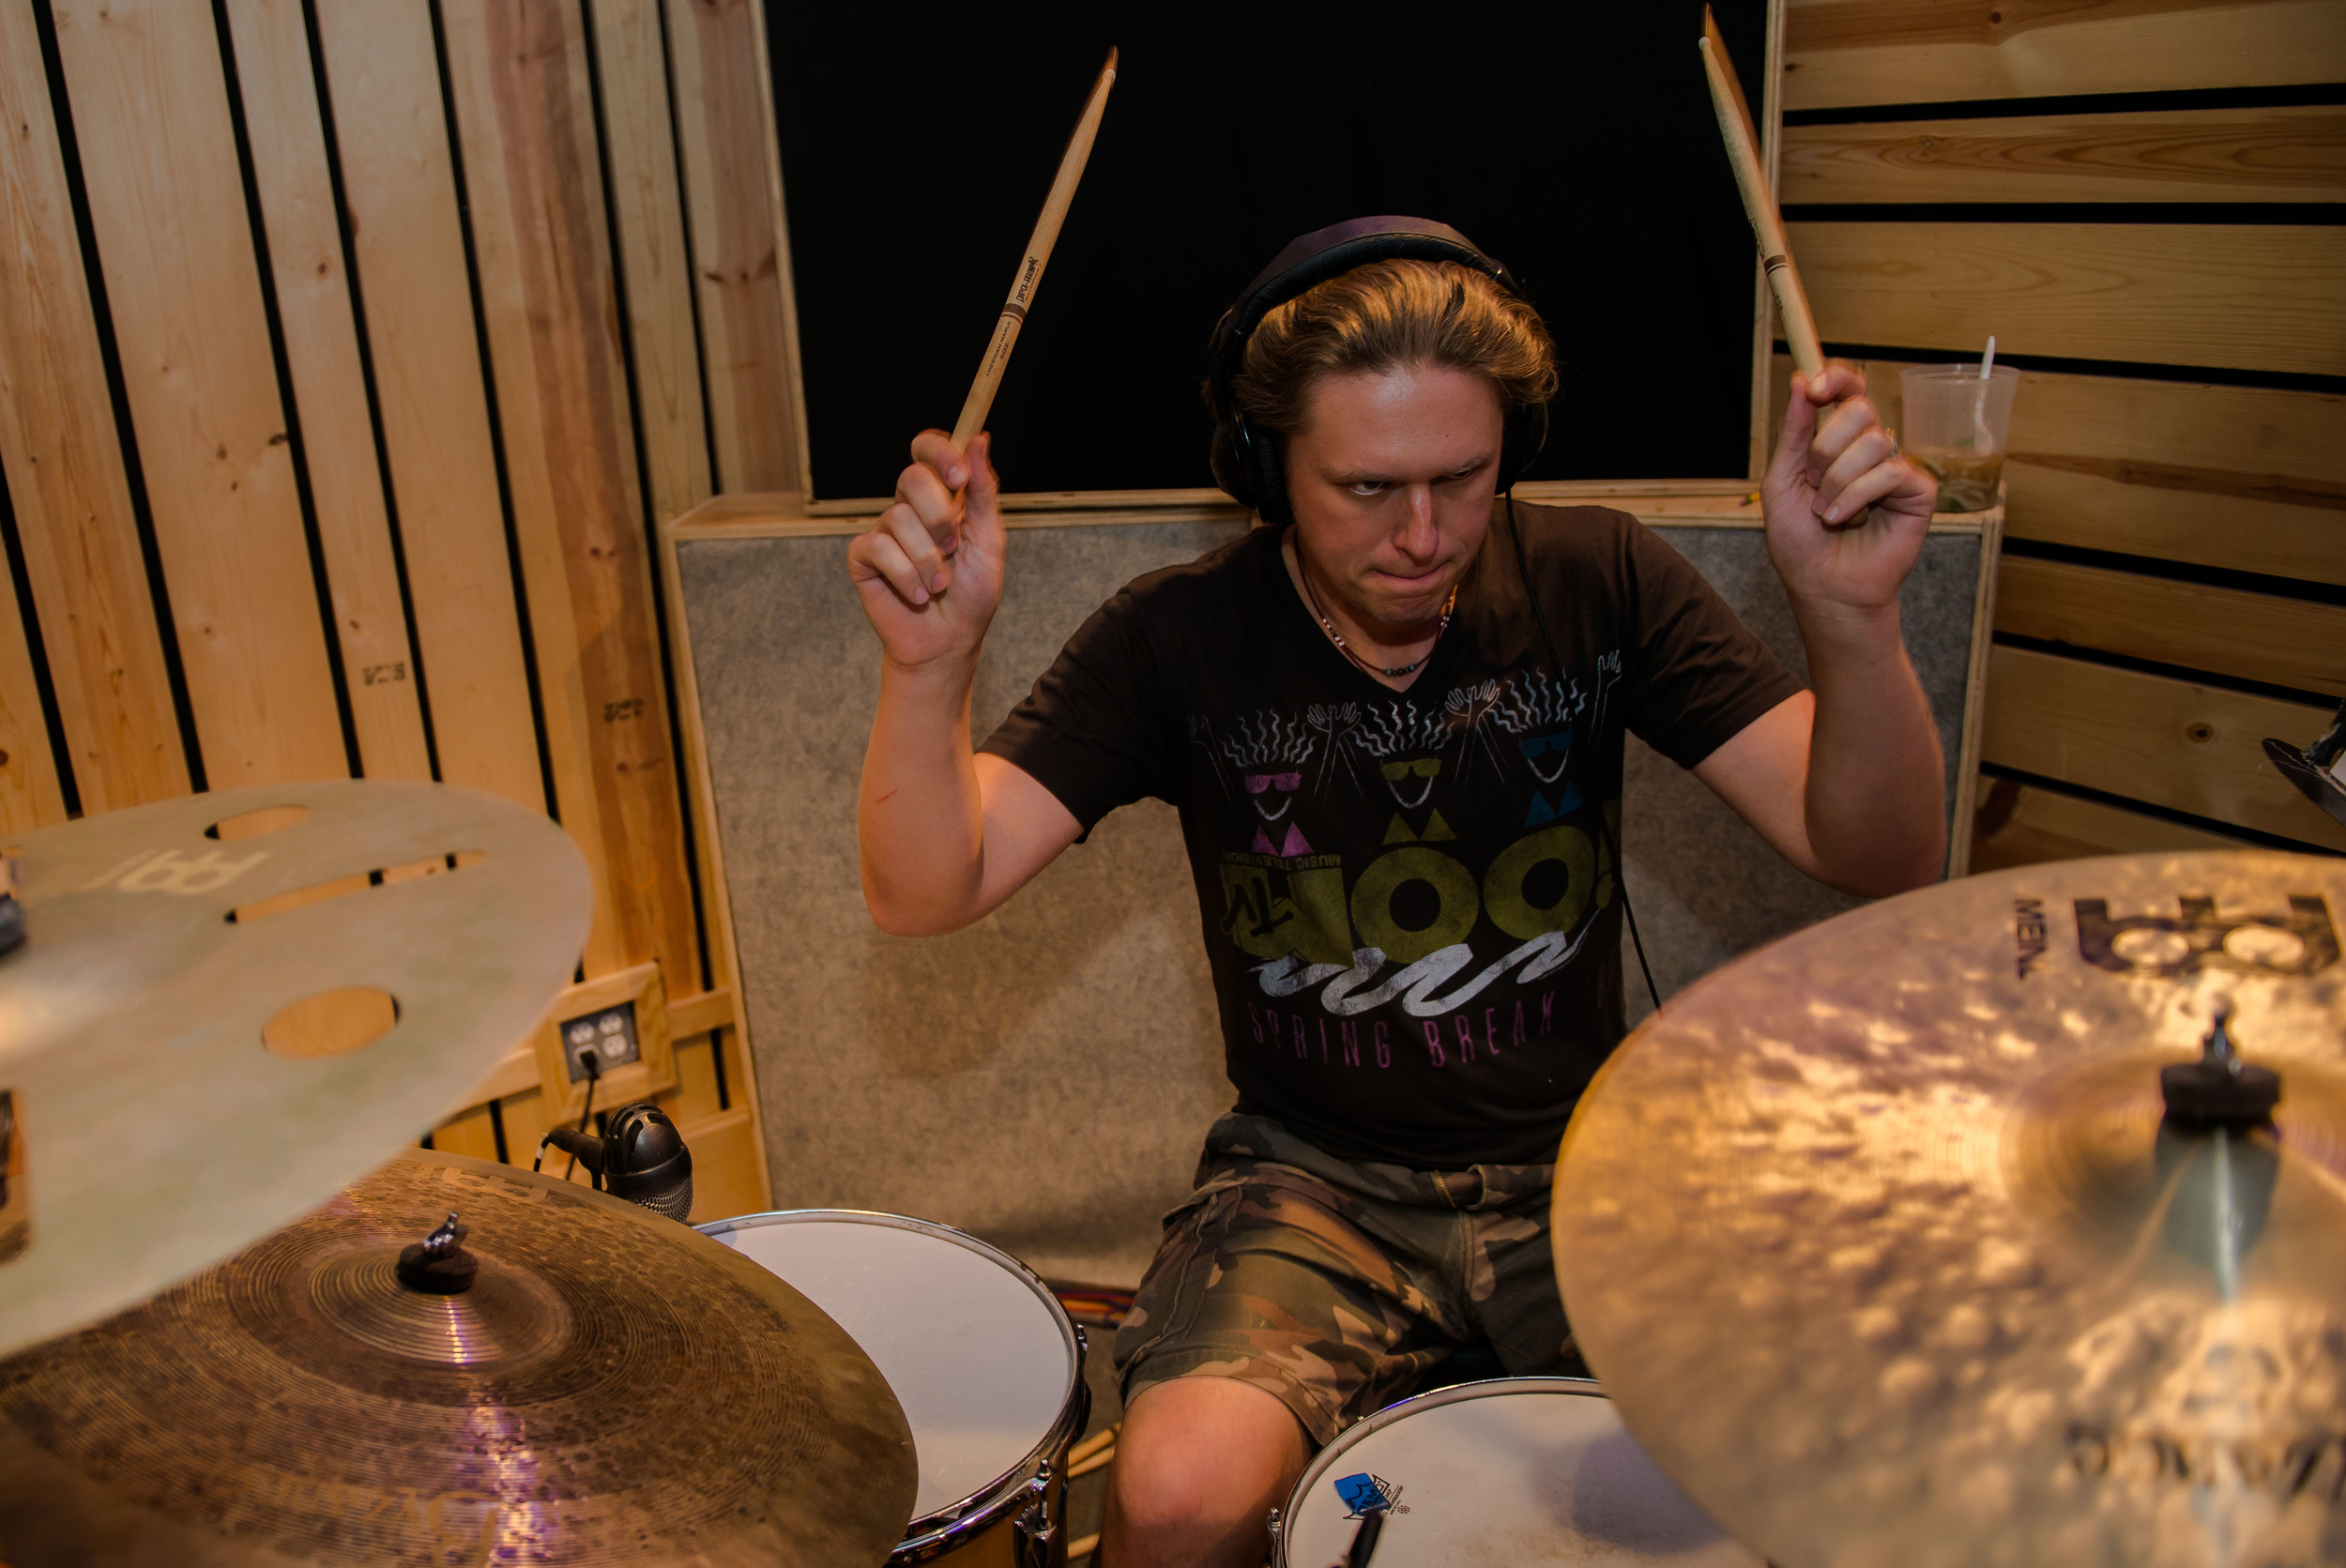 Matt Zebroski on drums